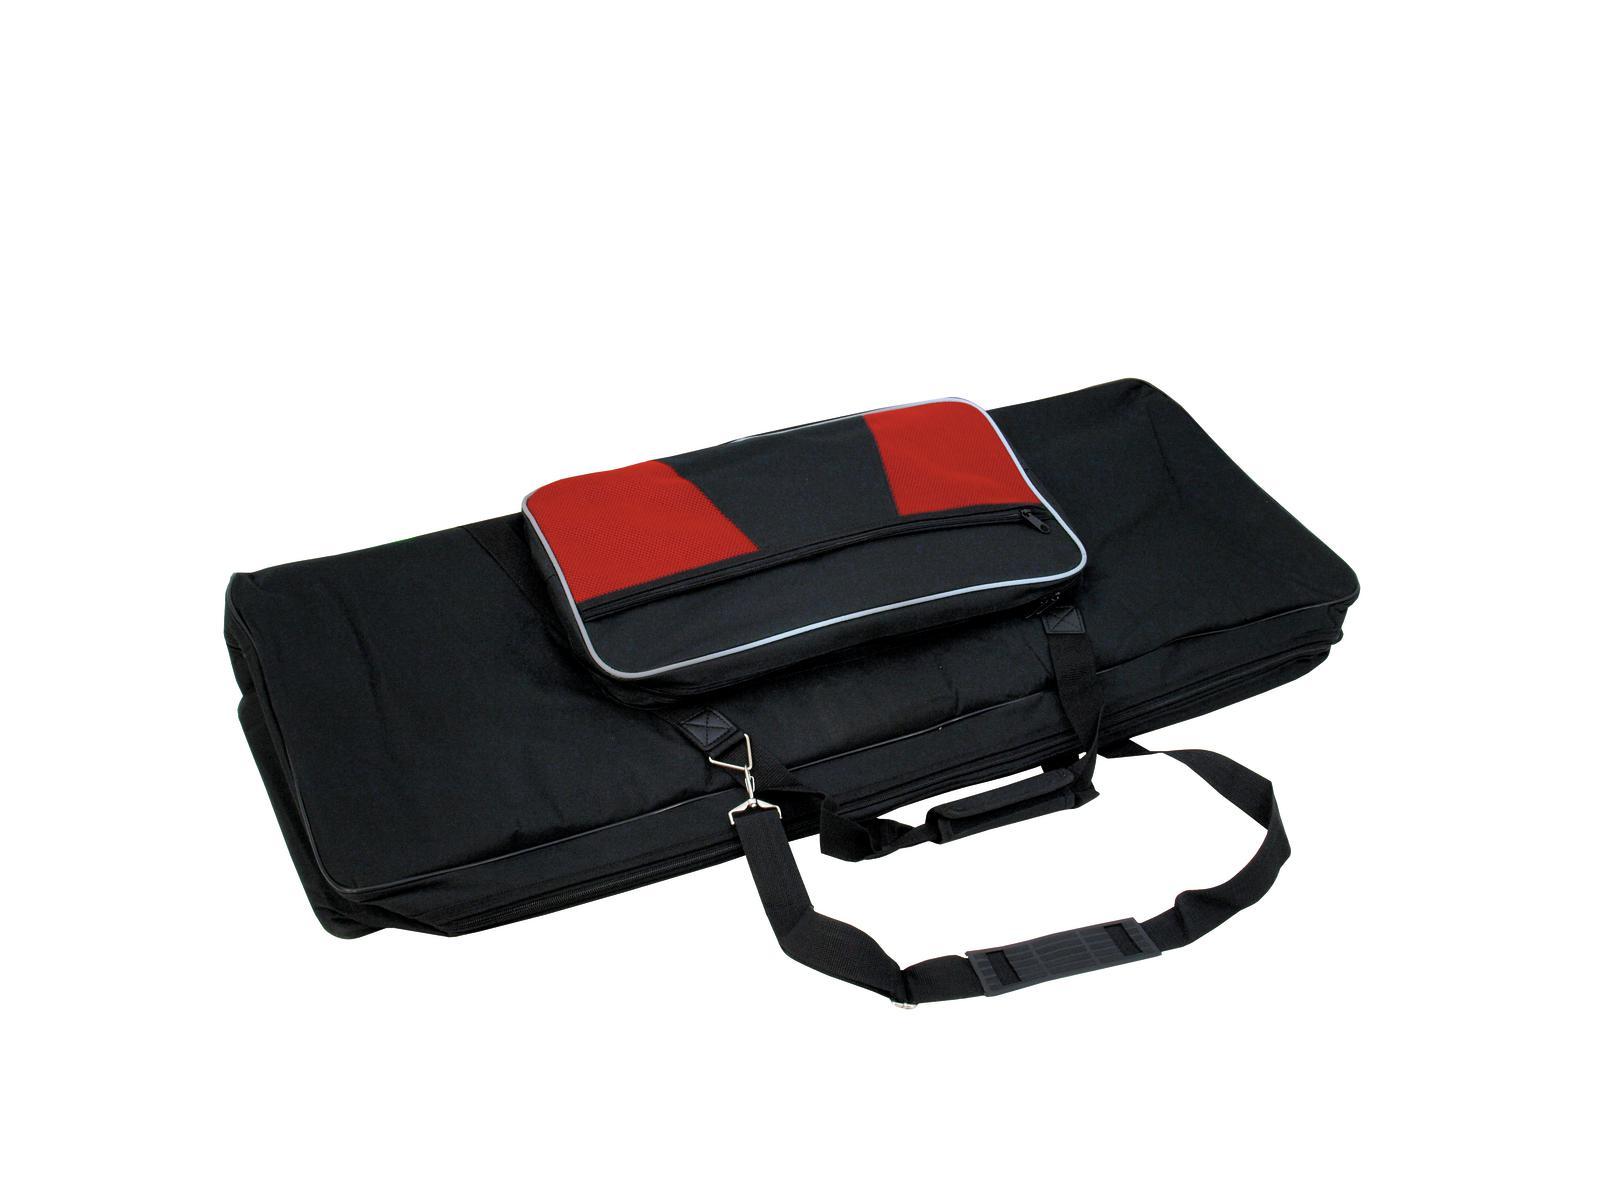 DIMAVERY Soft-Bag für Keyboard, M